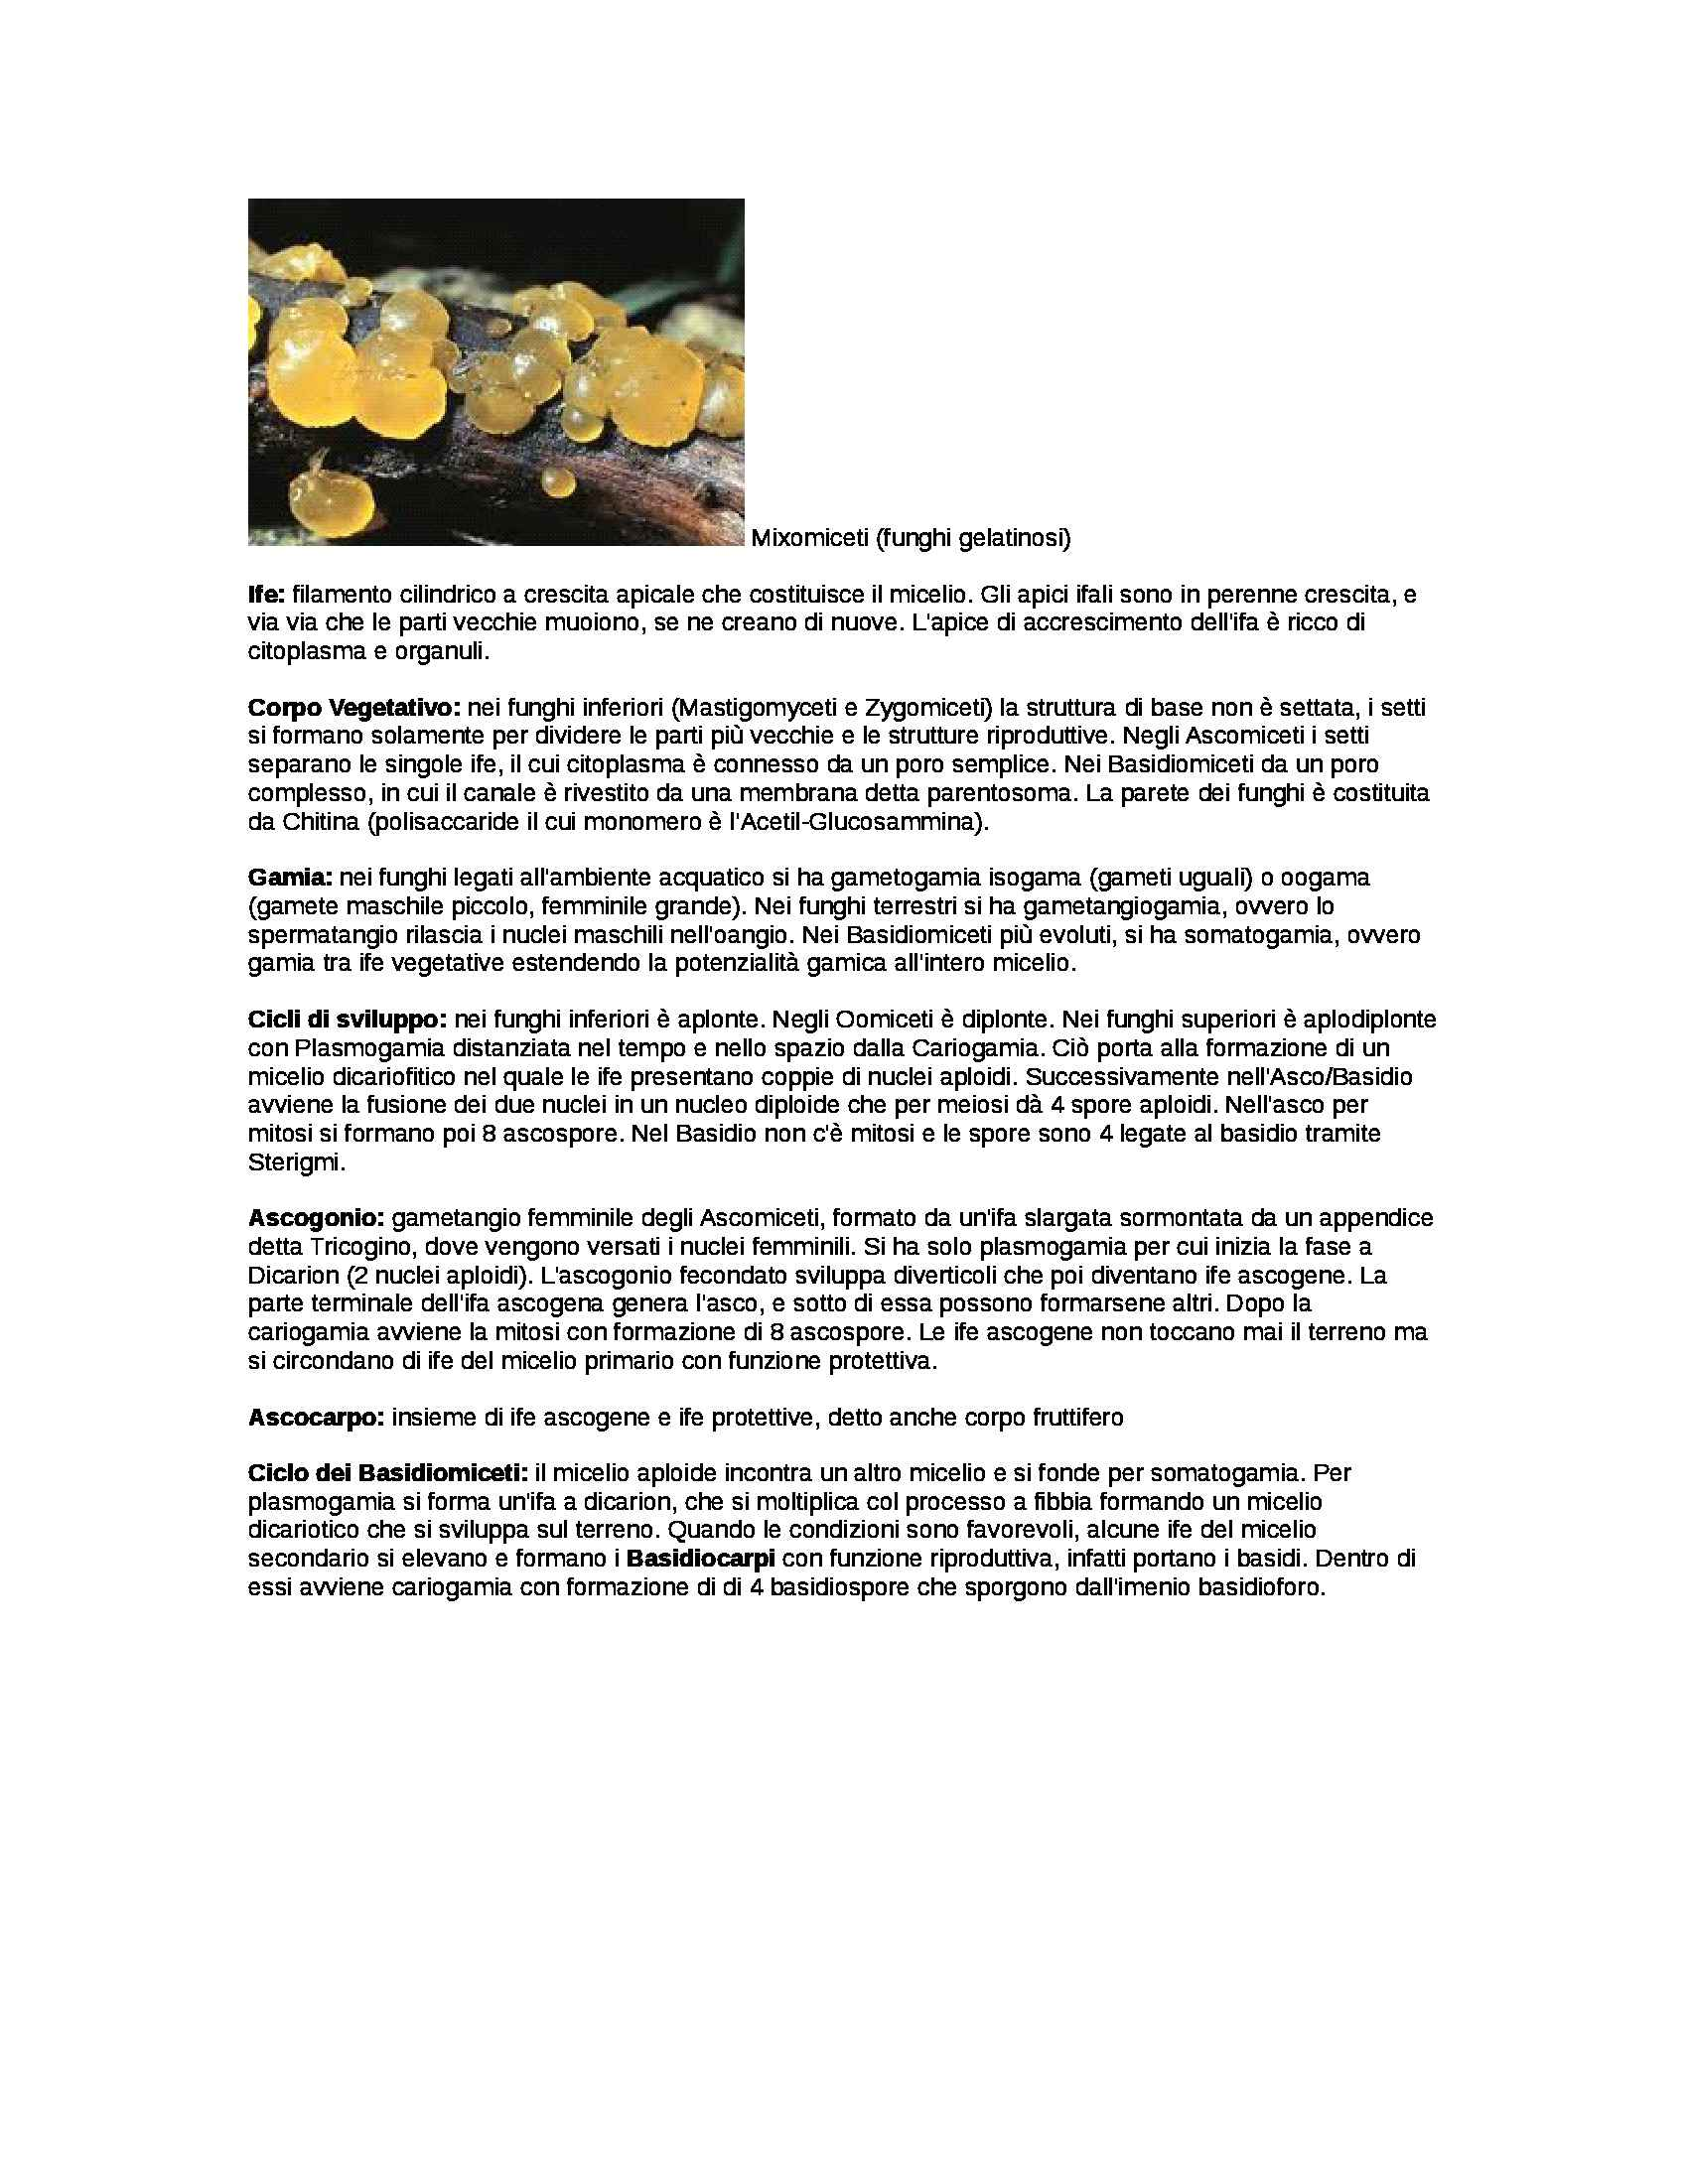 Botanica - Appunti Pag. 6